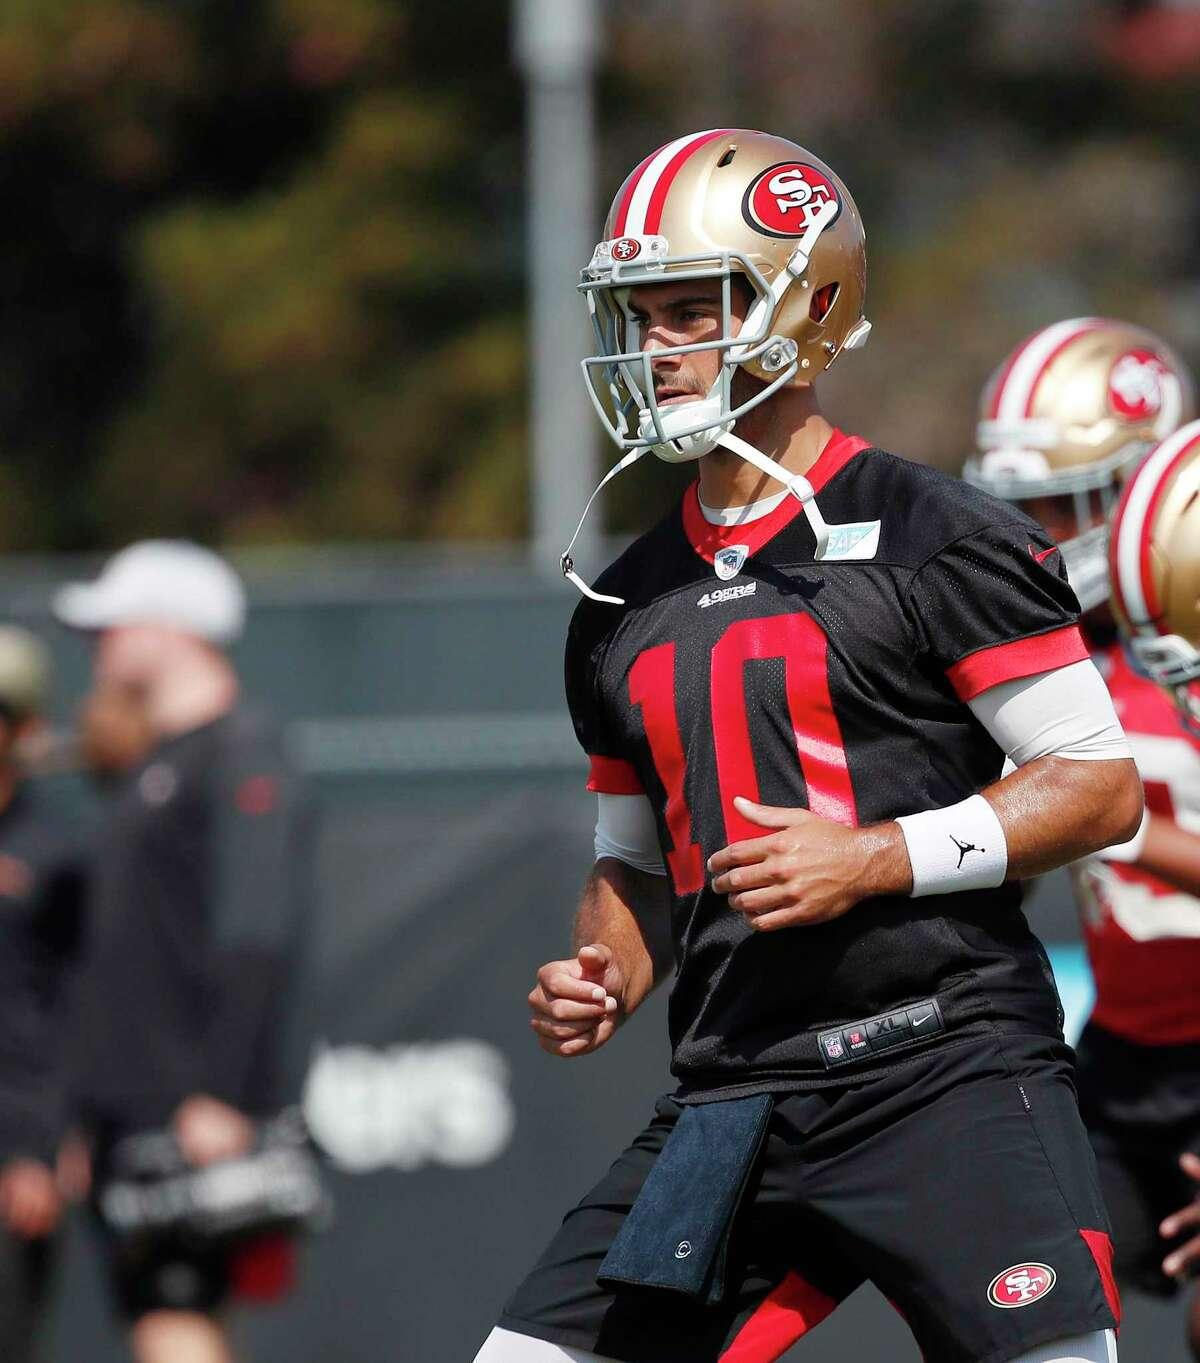 San Francisco 49ers quarterback Jimmy Garoppolo works out during an NFL football training camp in Santa Clara, Calif., Saturday, July 31, 2021. (AP Photo/Josie Lepe)